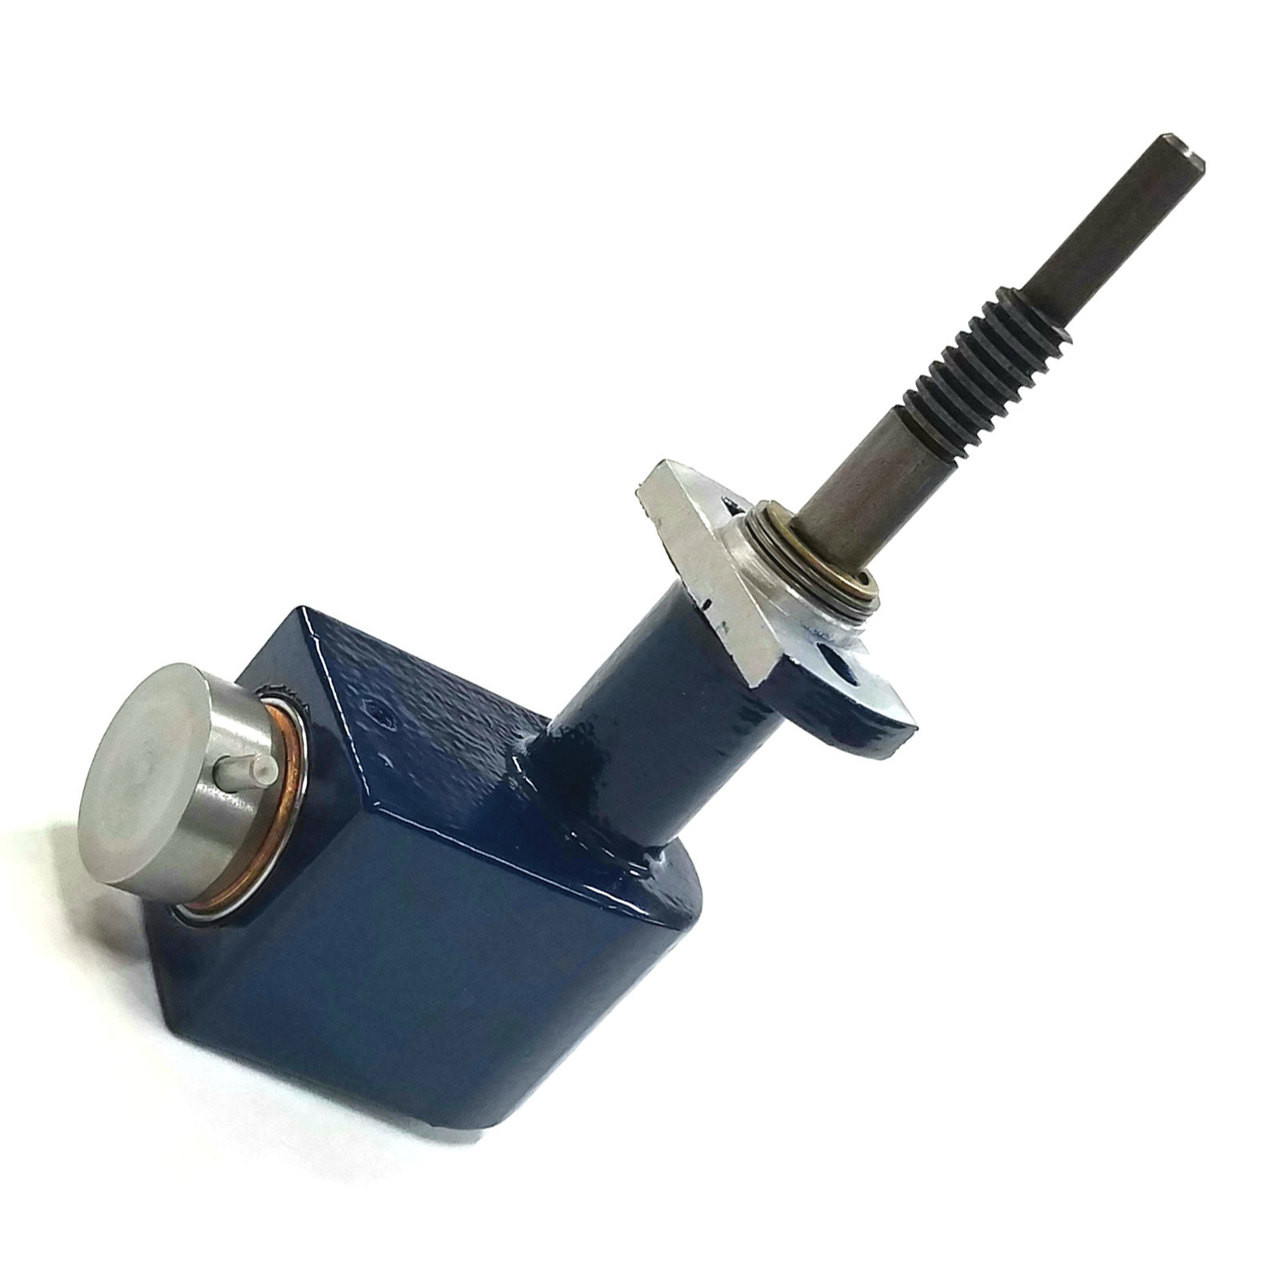 9815 - Ammco 4000 4100 7500 Brake Lathe Right Angle Gear Box Drive Assembly  | McBay Performance